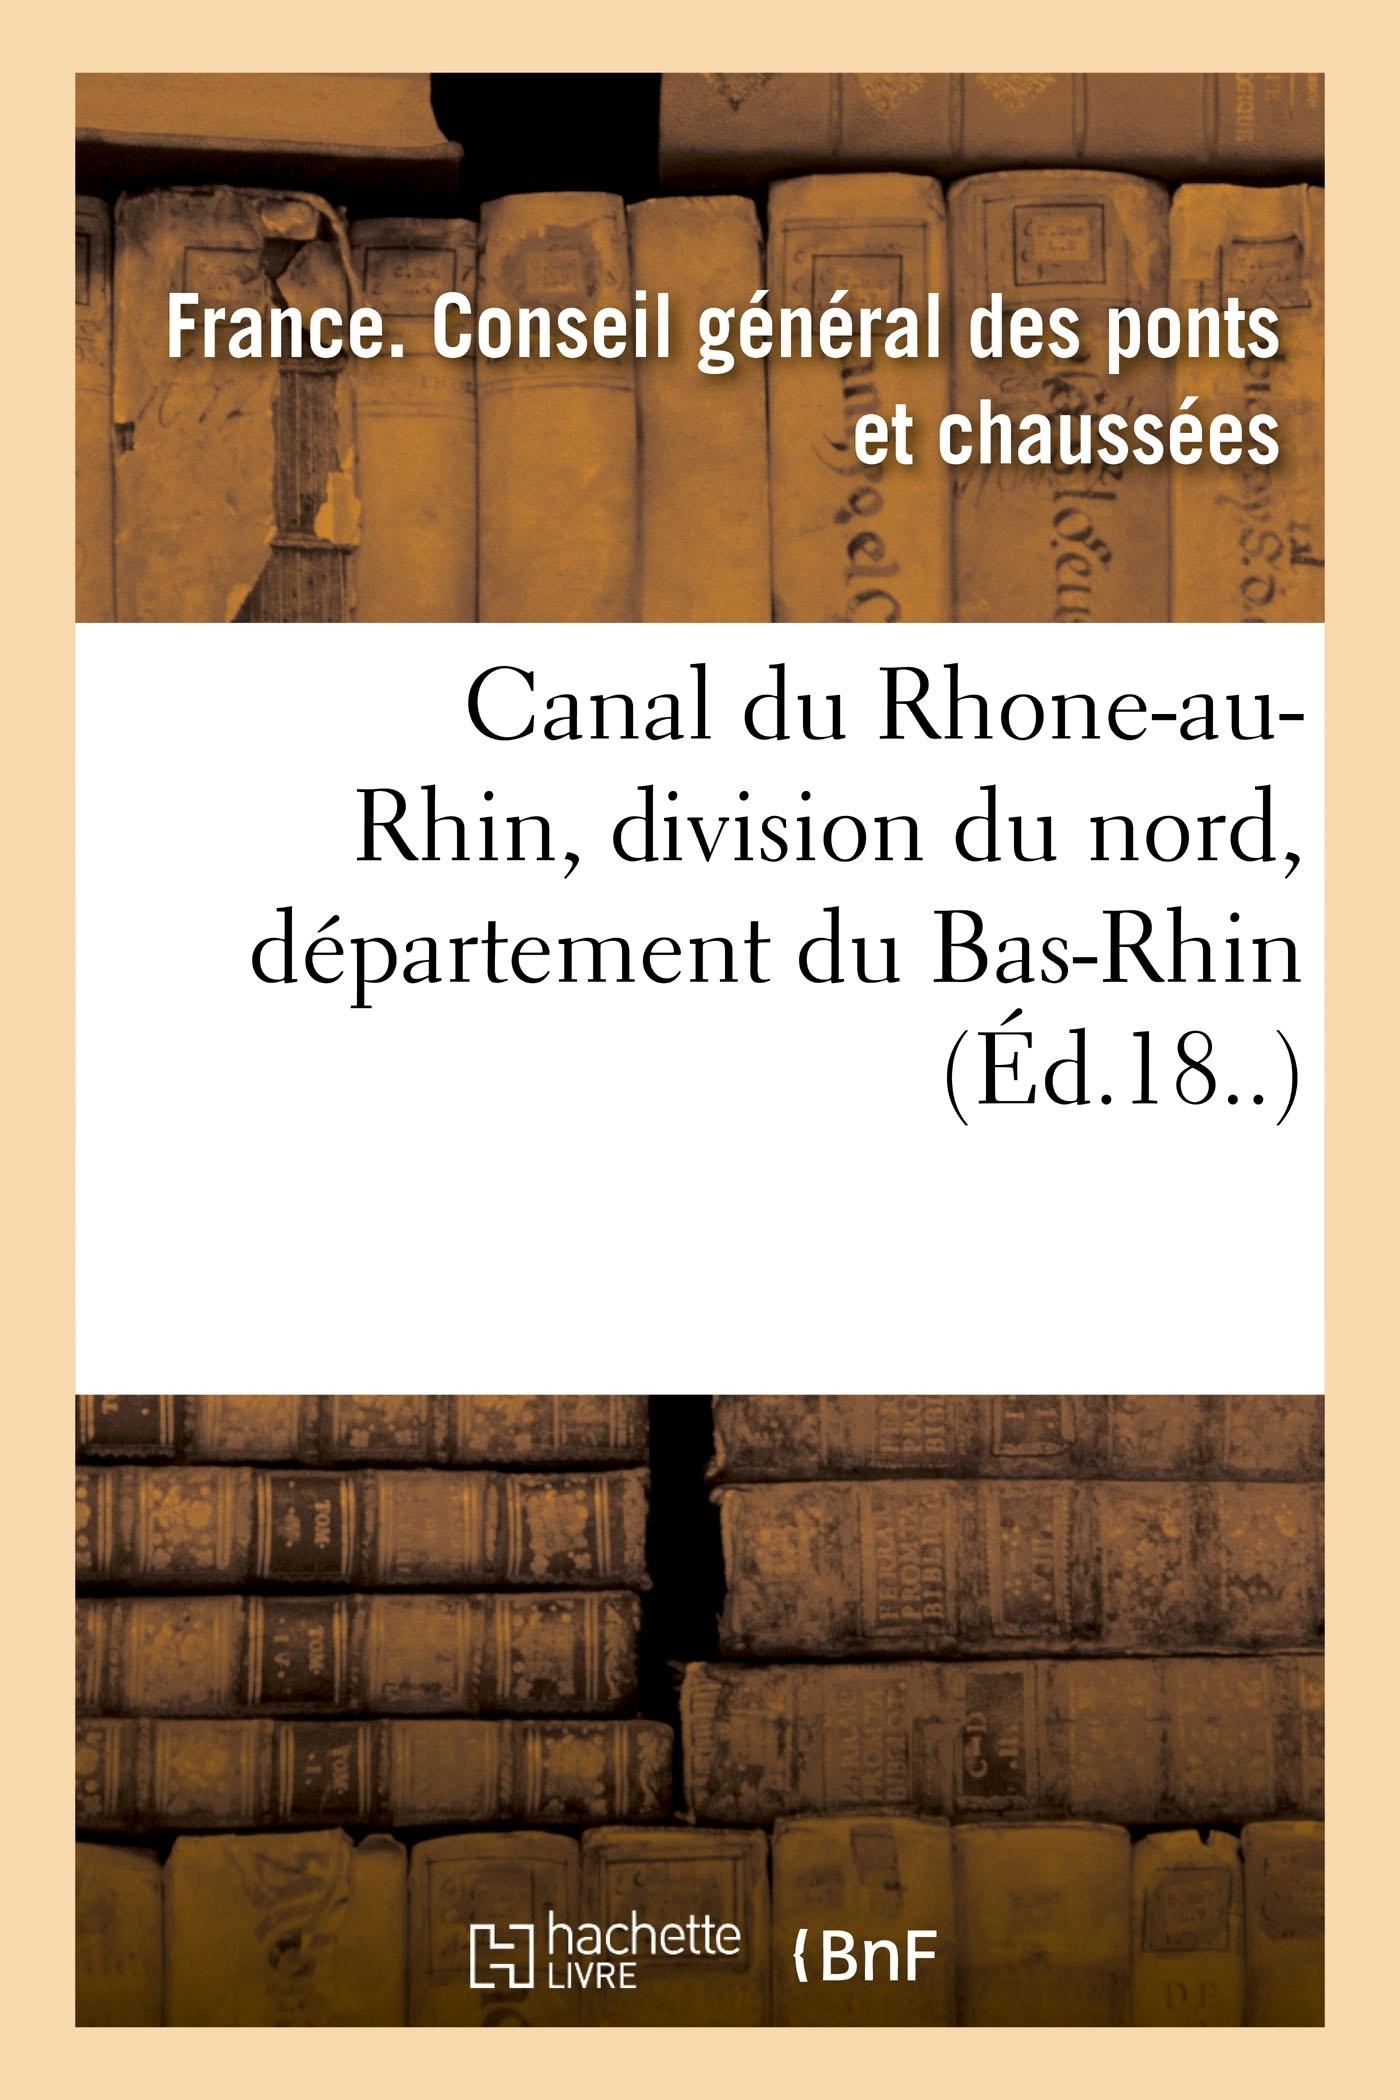 CANAL DU RHONE-AU-RHIN, DIVISION DU NORD, DEPARTEMENT DU BAS-RHIN